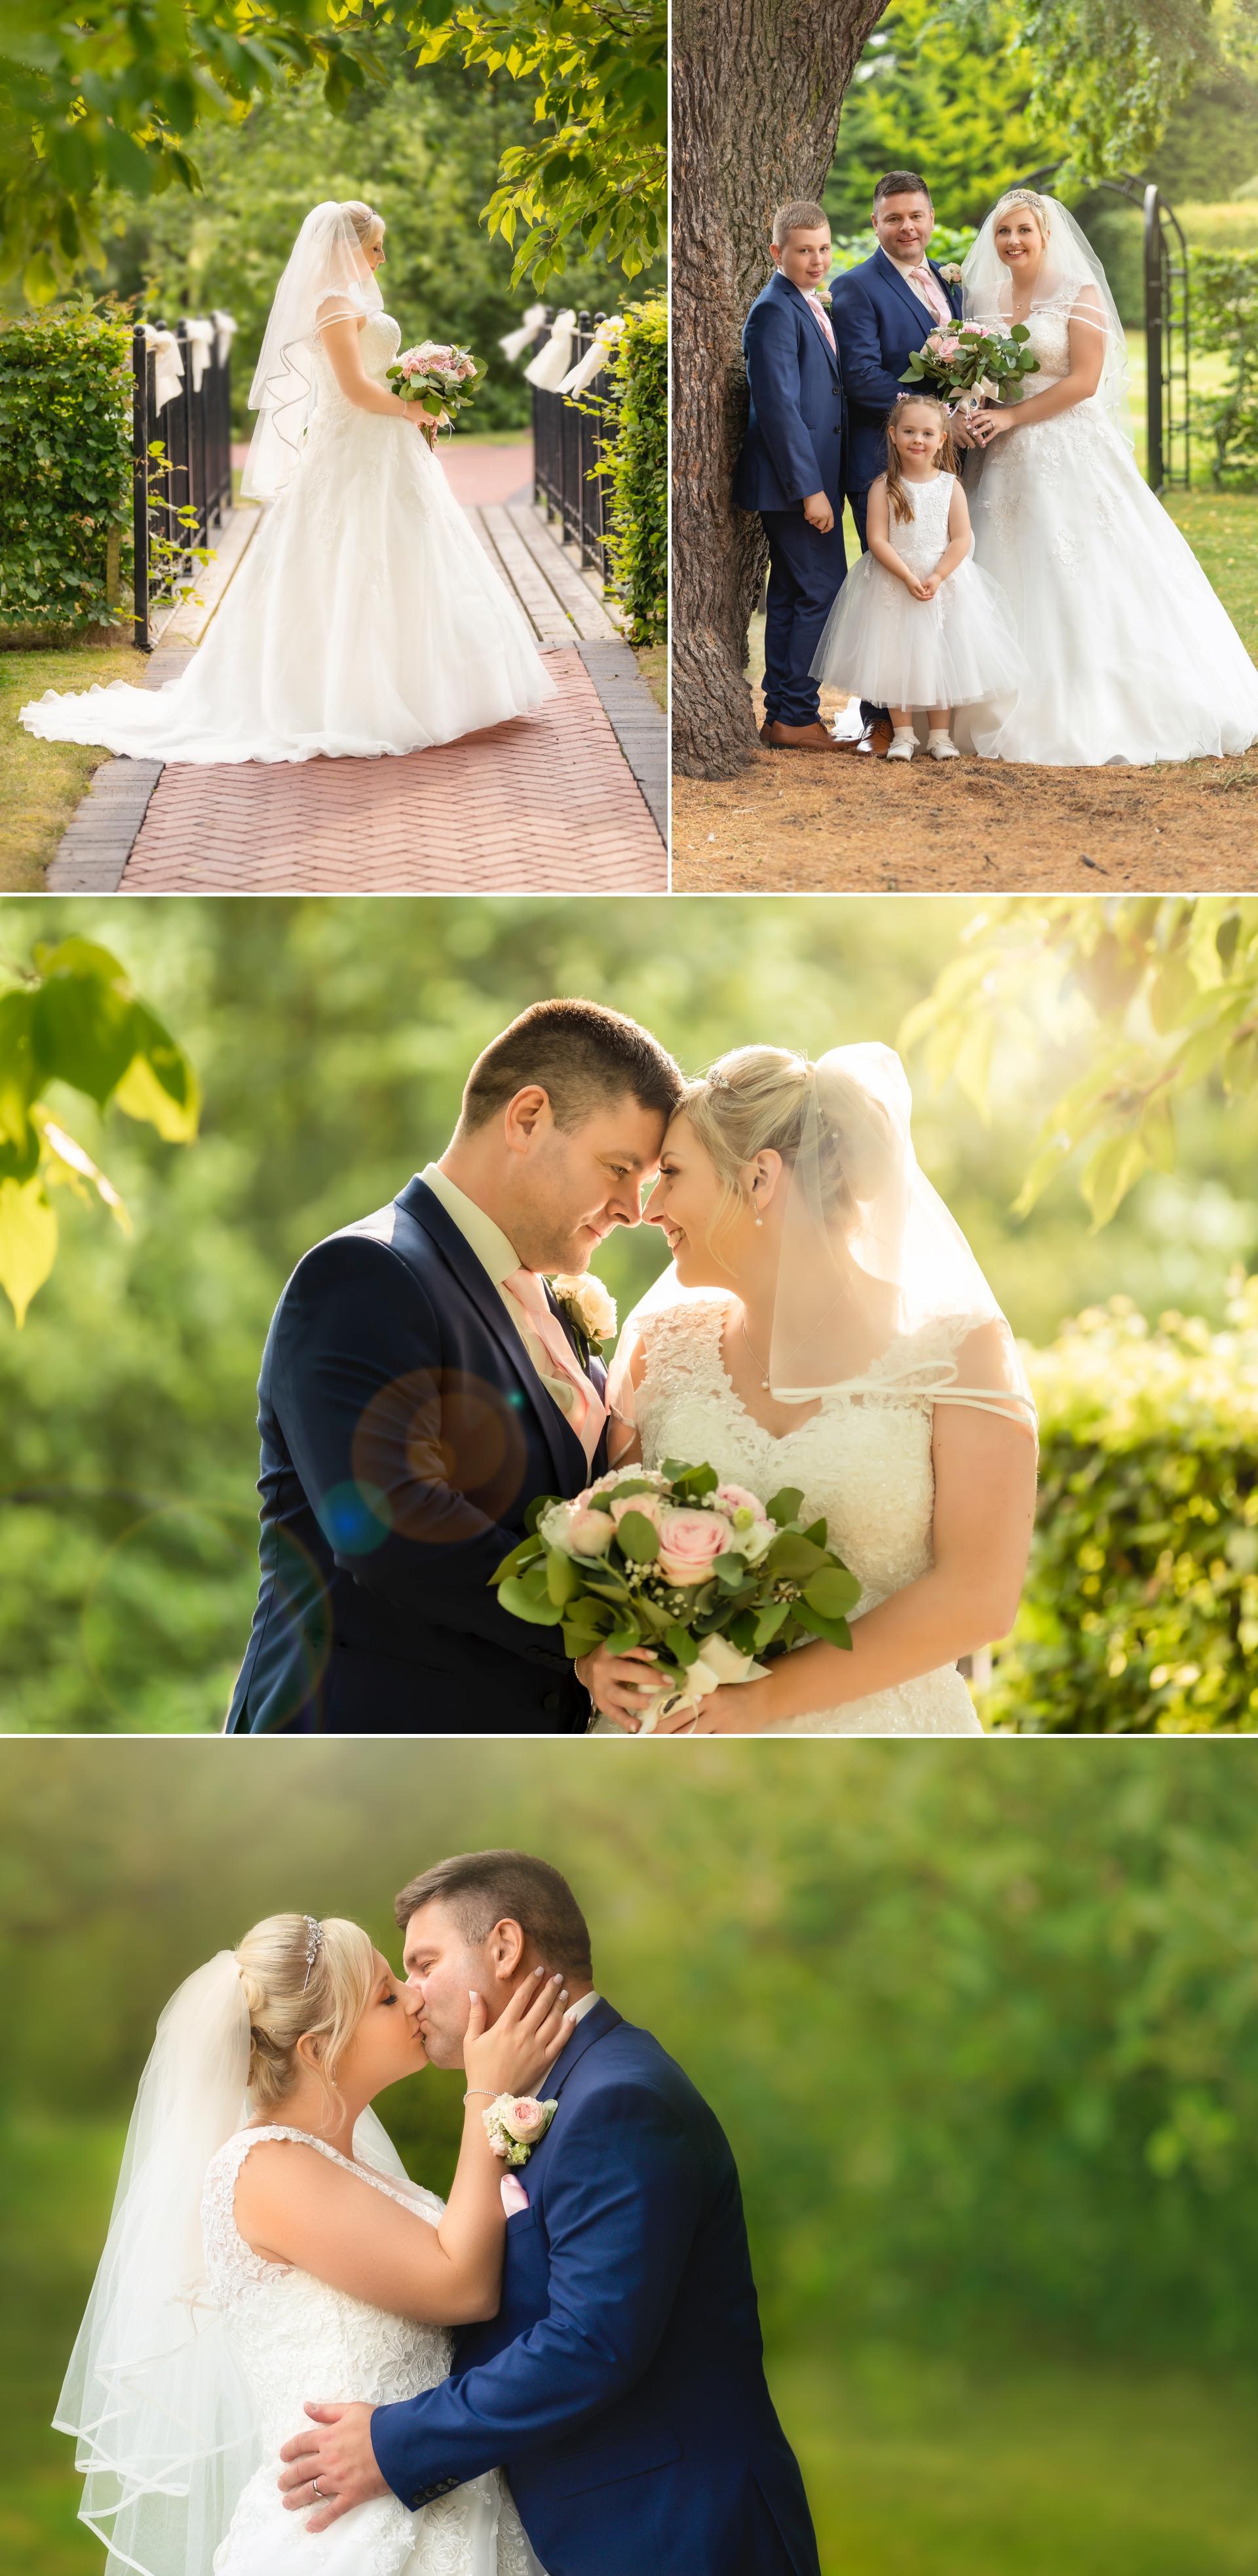 Beutiful bride and groom wedding images